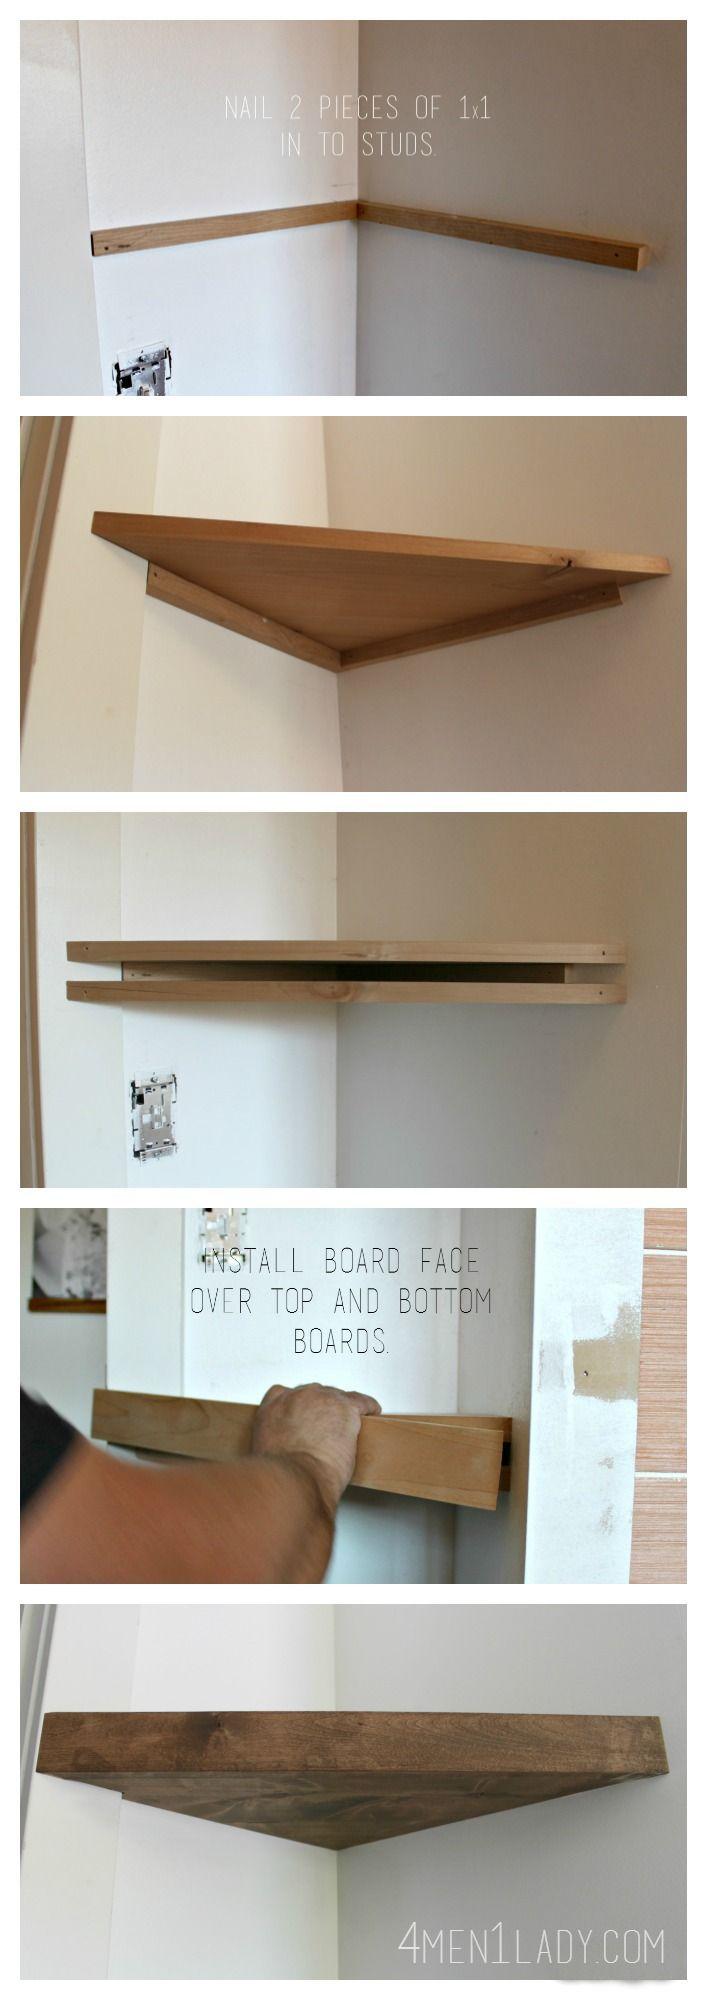 Best 25+ Corner Bathroom Storage Ideas On Pinterest | Small Bathroom Shelves,  Tiny Bathroom Makeovers And Small Bathroom Bathtub